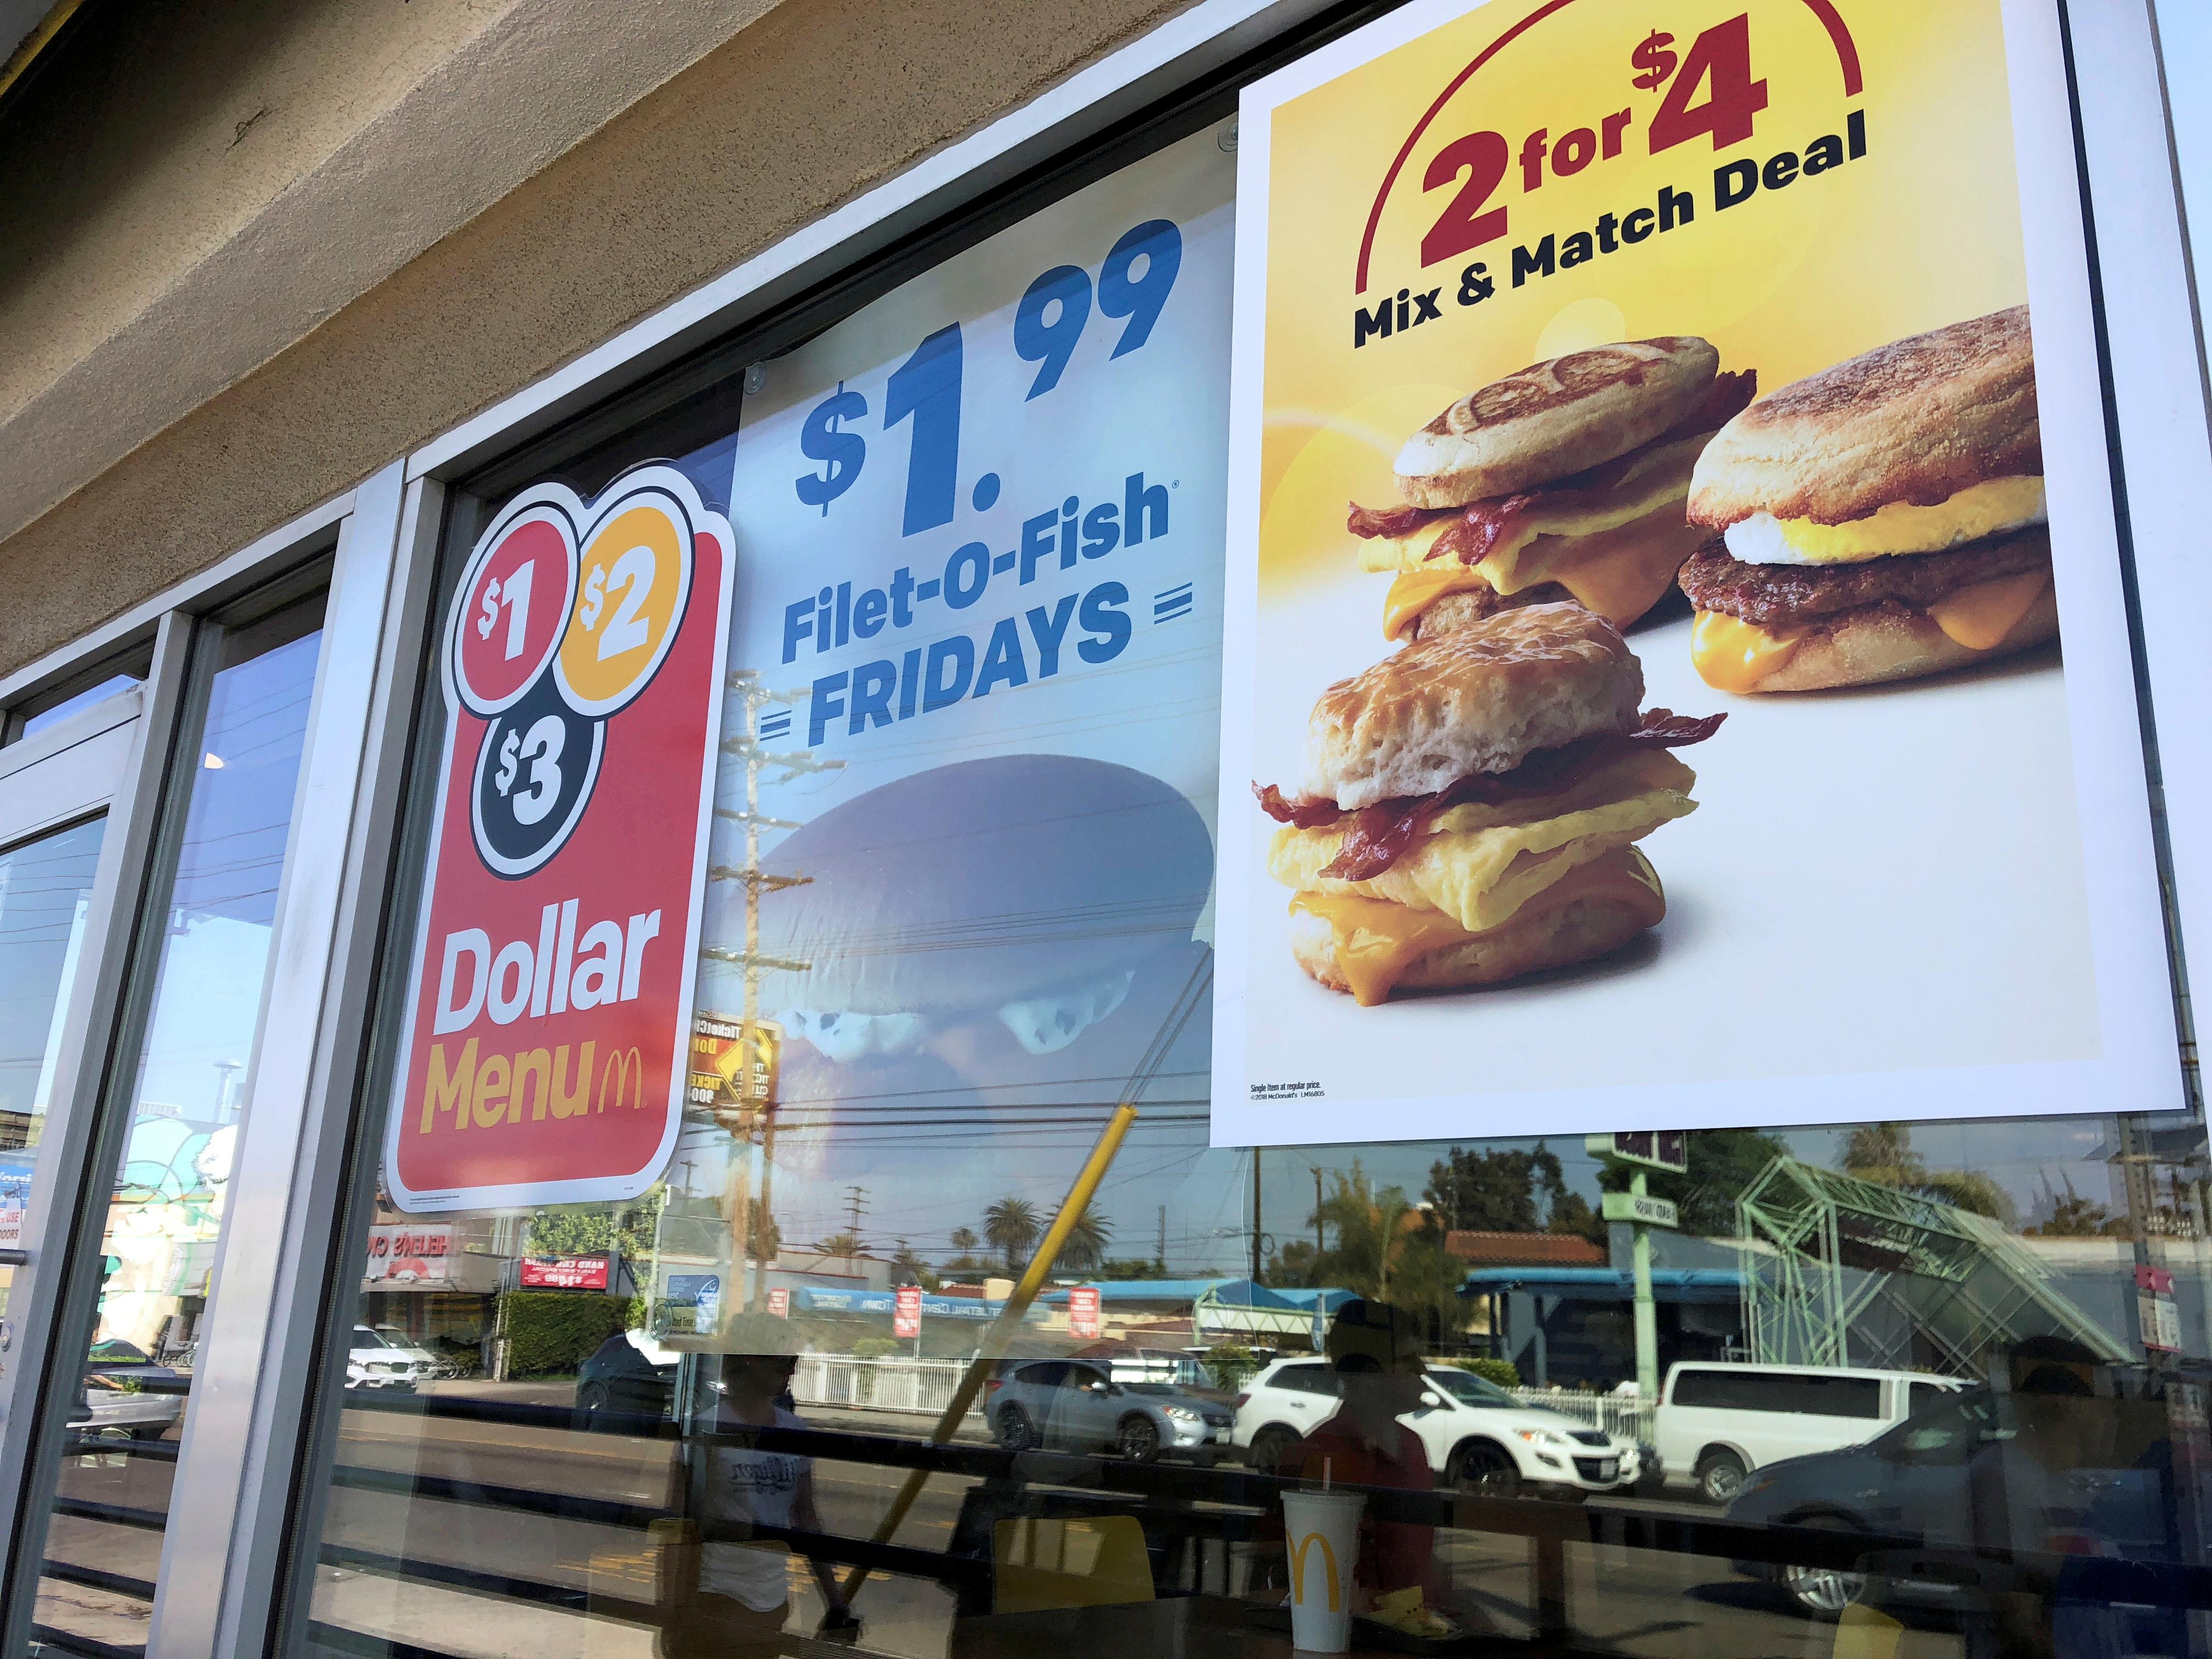 Dollar Menu advertisements are seen outside a McDonald's restaurant in Venice, California, April 29, 2018. REUTERS/Lisa Baertlein